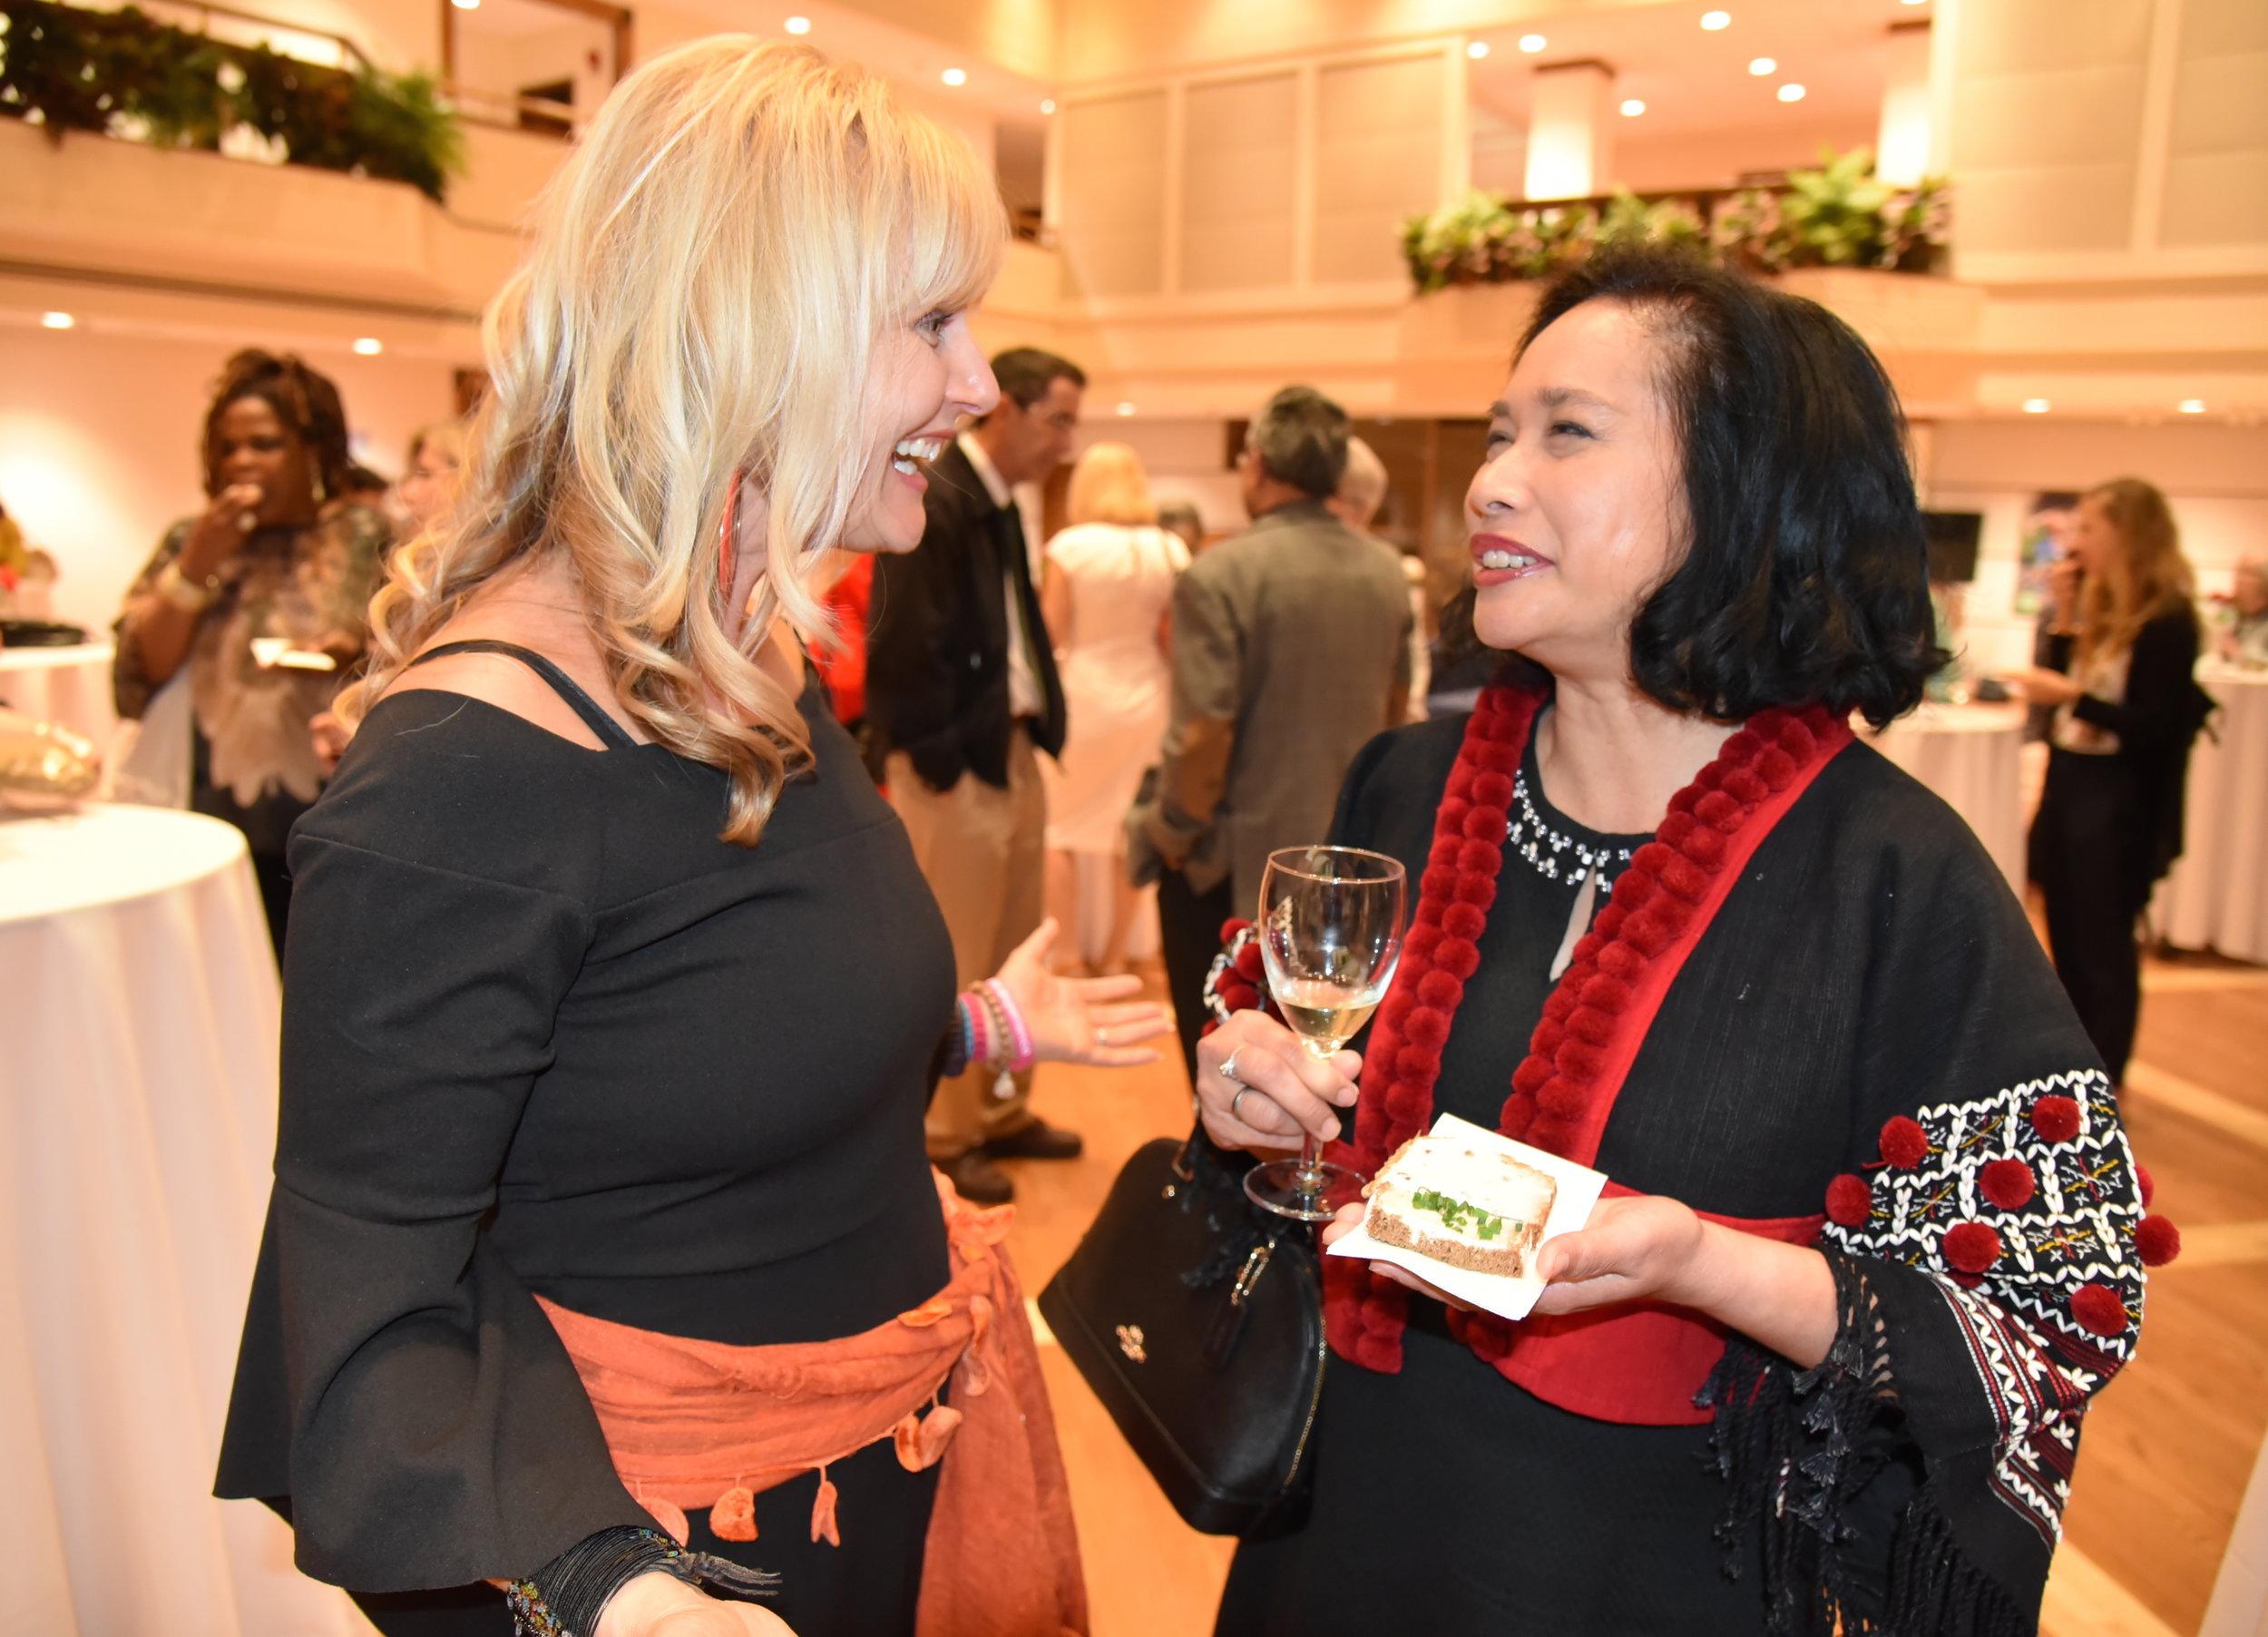 Author Bettina Gordon-Wayne with guest Kulwadee Tongpubesra Eisingerich